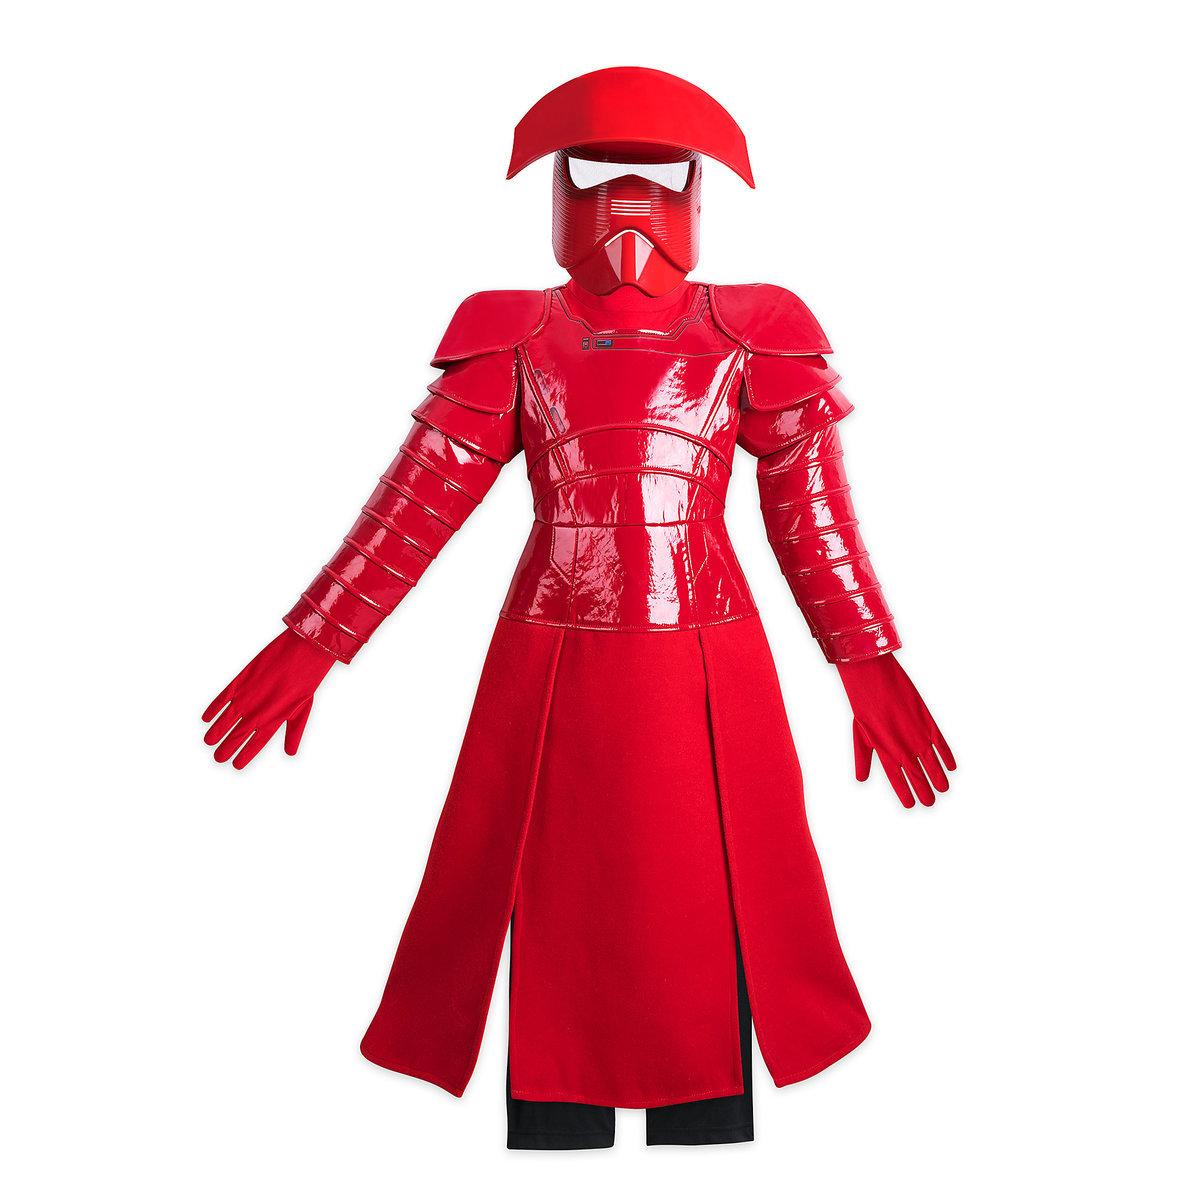 Female assassin in latex dress cosplay upskirt - 5 1